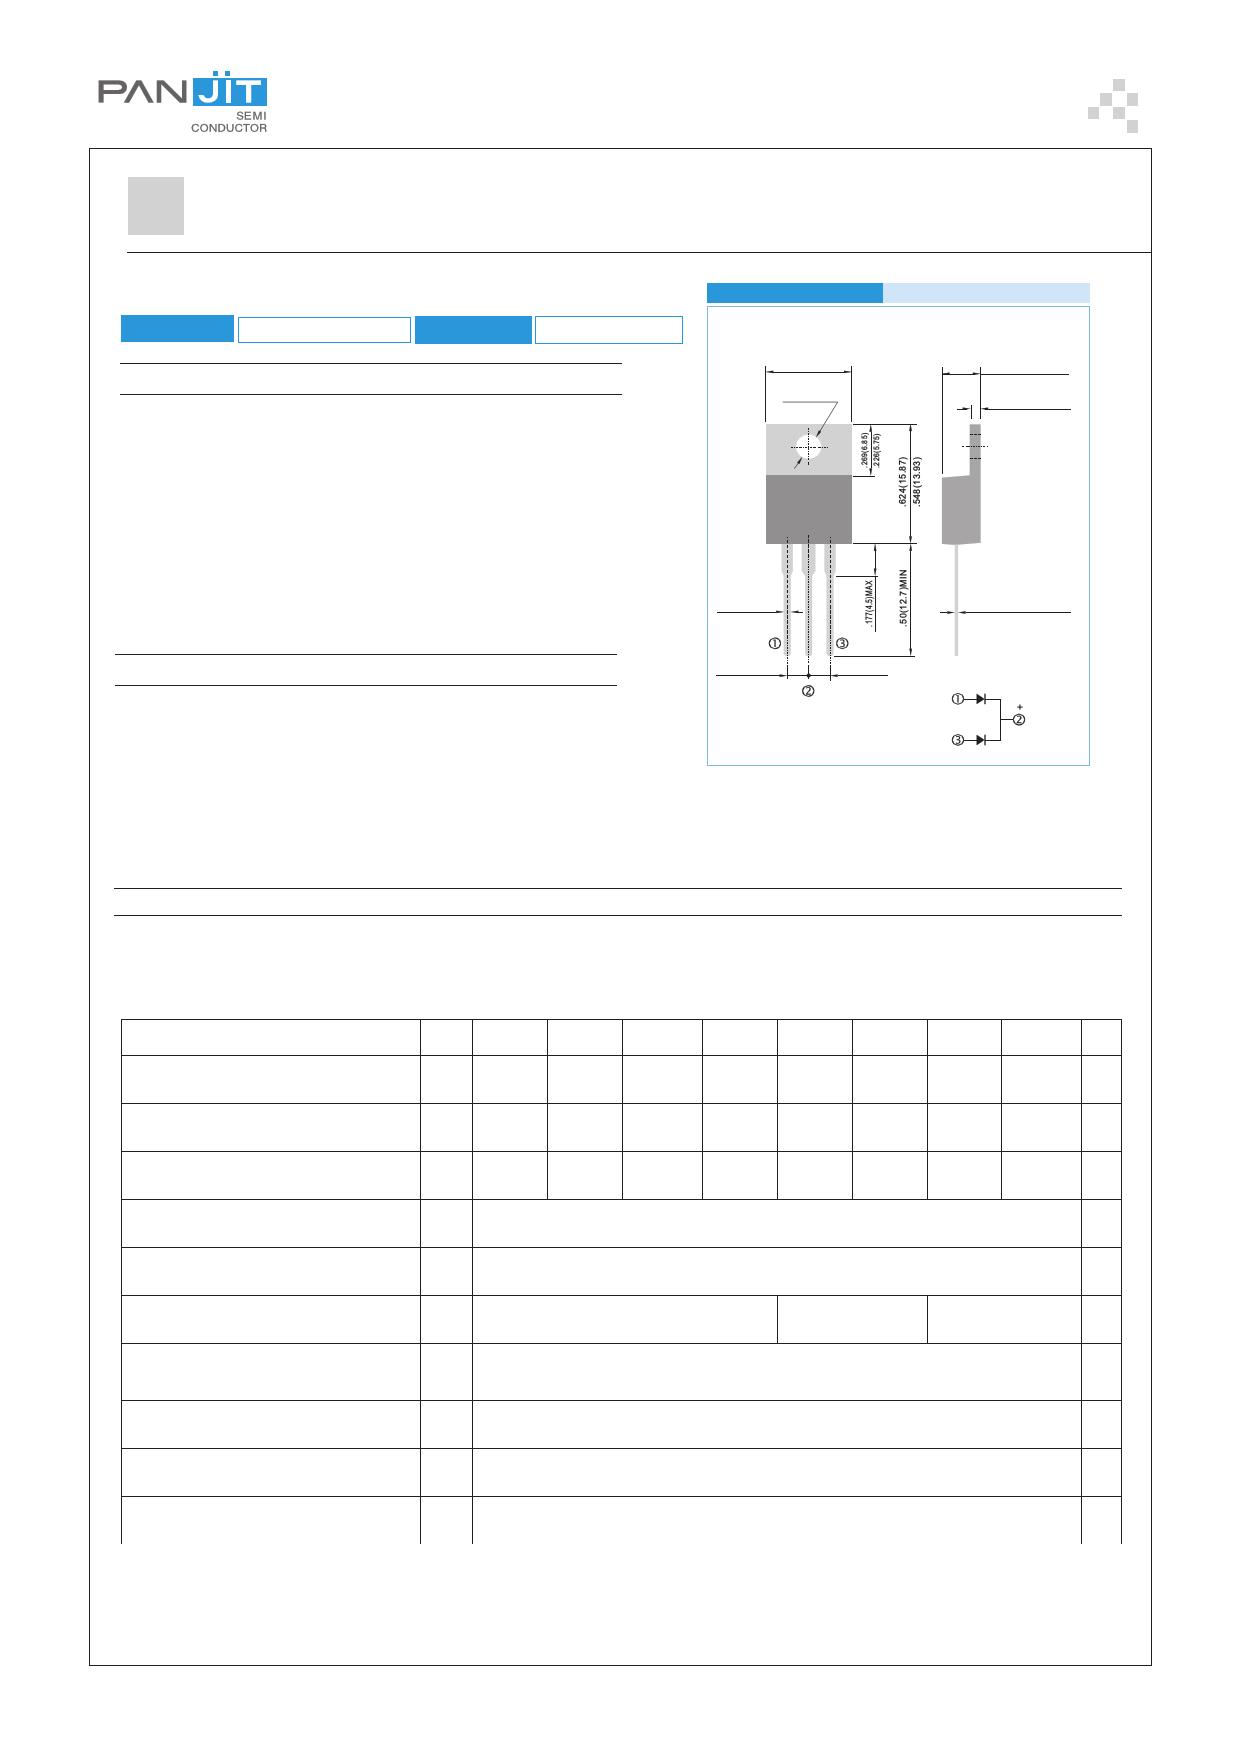 MBR1020CT datasheet